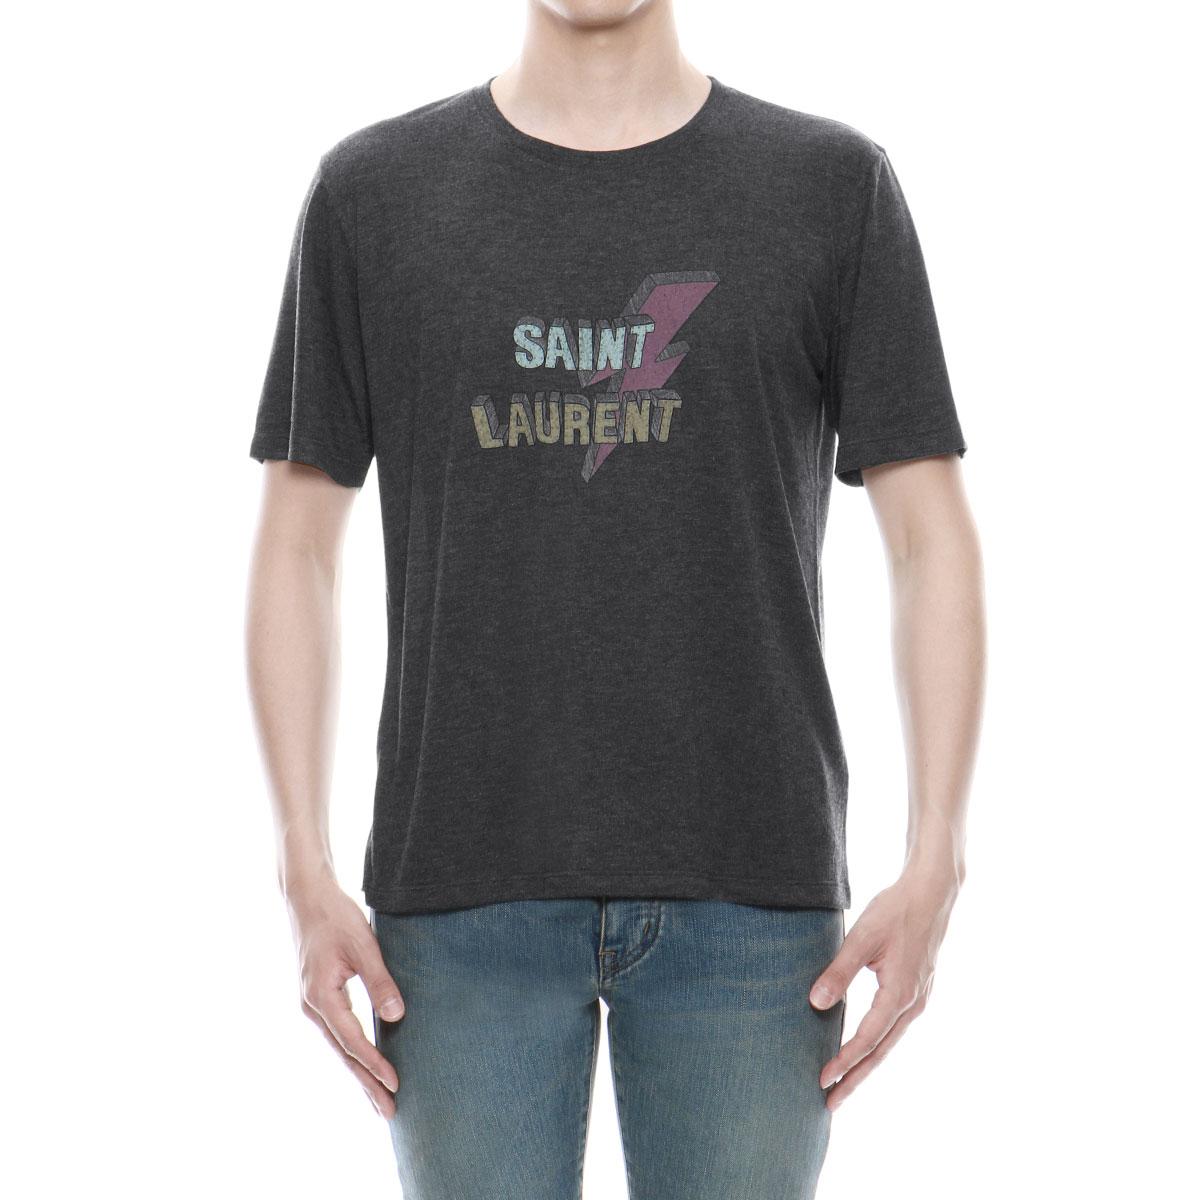 af8b15256e3630 ... 500898 Saint-Laurent SAINT LAURENT T-shirt men YB2LW 1090 short sleeves  T- ...